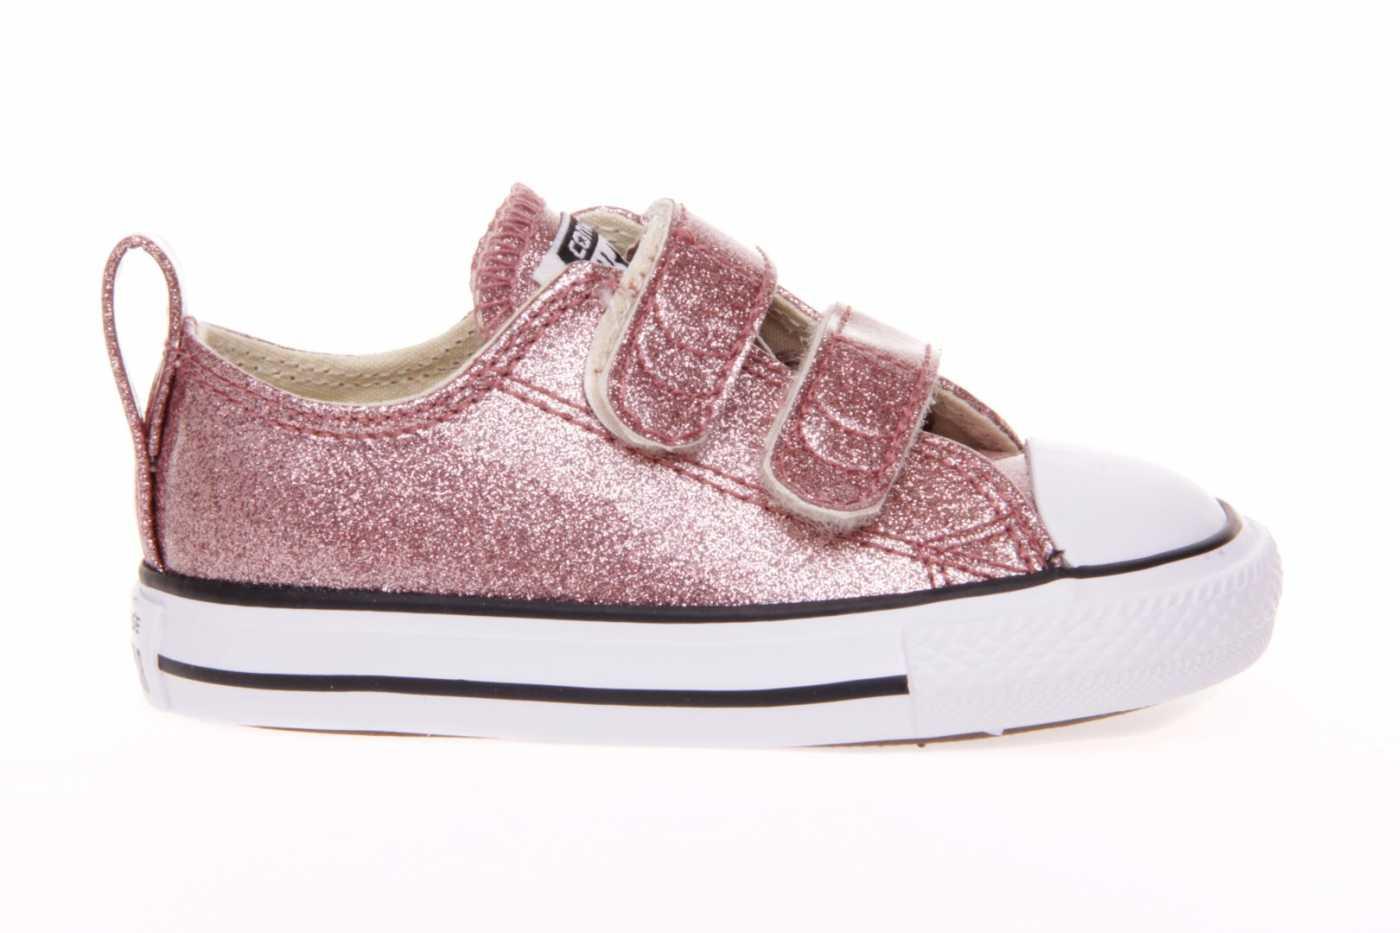 Comprar Estilo Lona Joven Tipo Zapato Niña Textil Rosa Color PrwOPa6Aqx